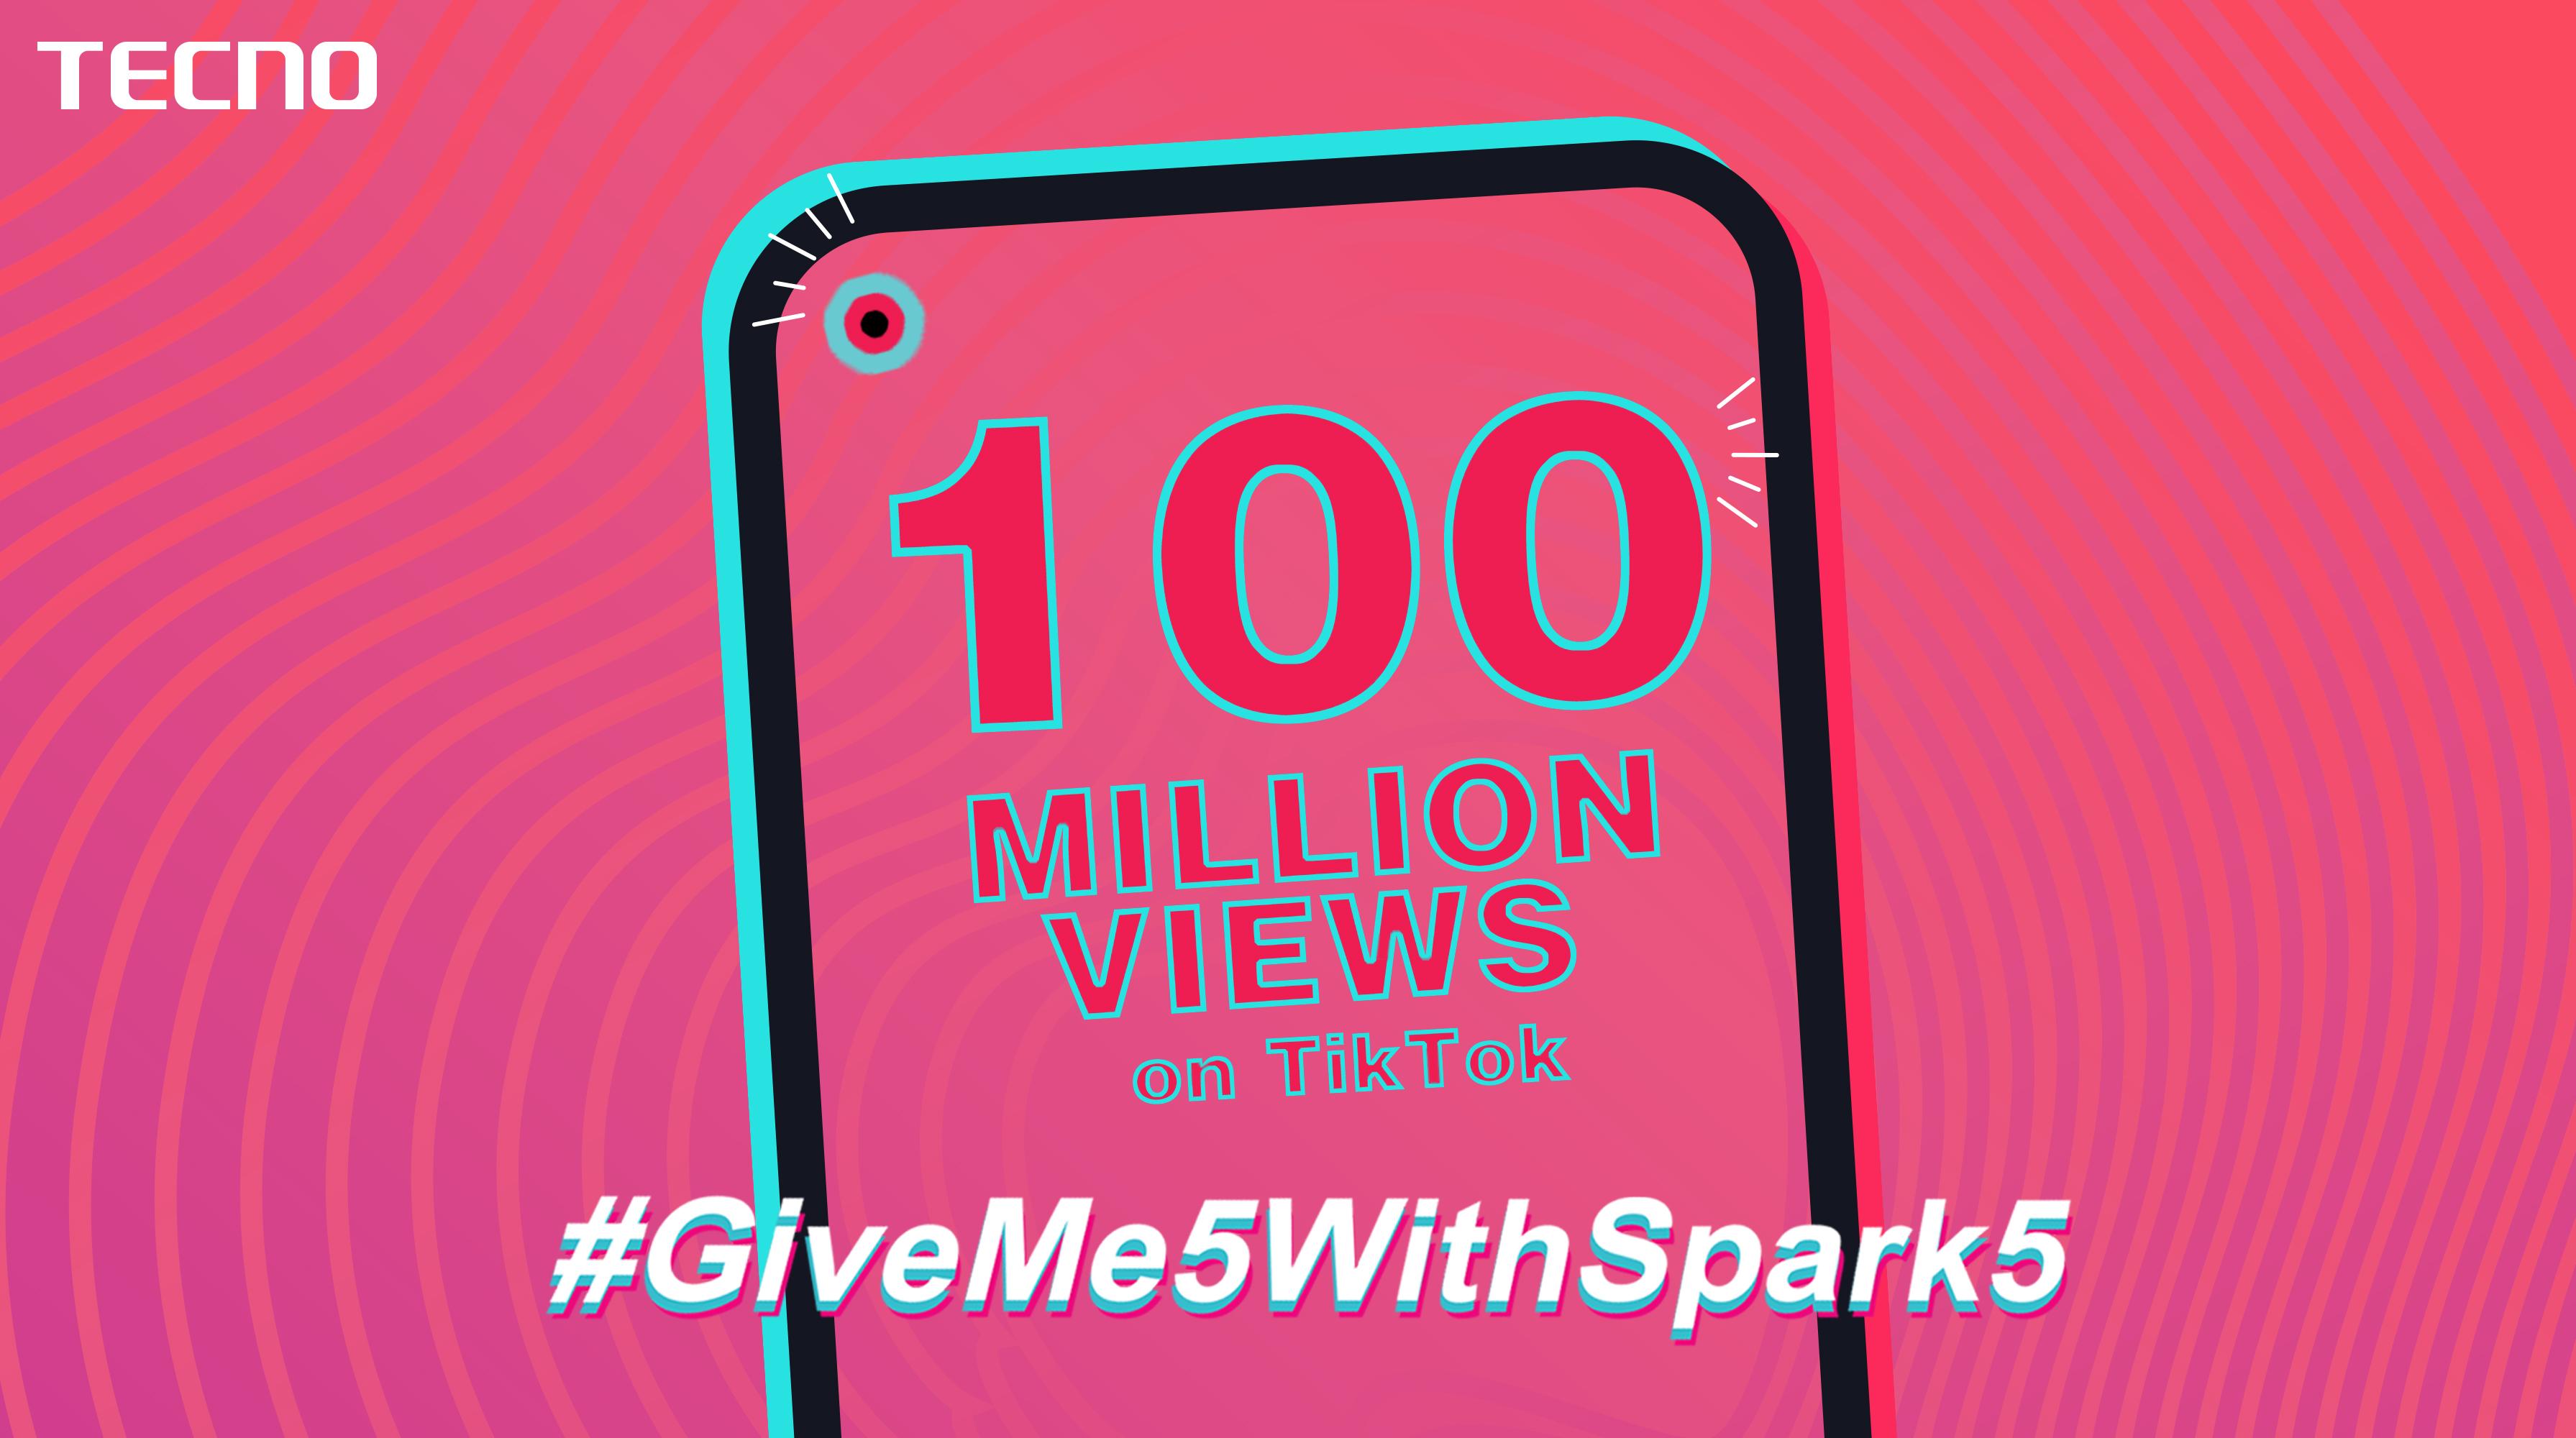 TECNO's #GiveMe5withSpark5 Challenge